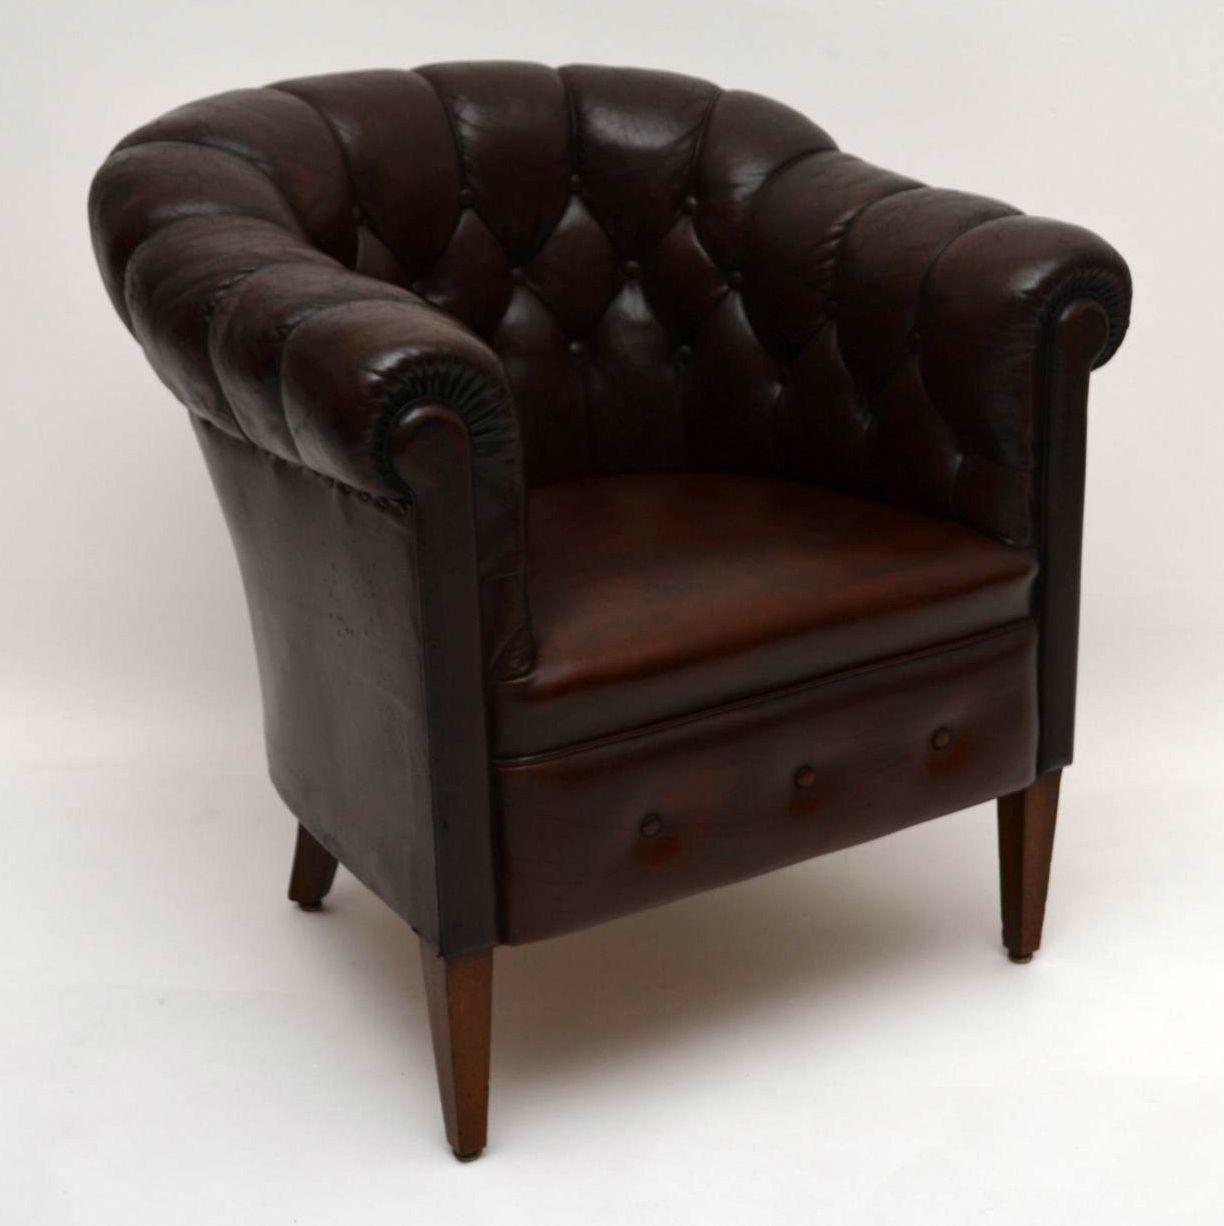 Pair of Antique Swedish Leather Armchairs | Interior ...